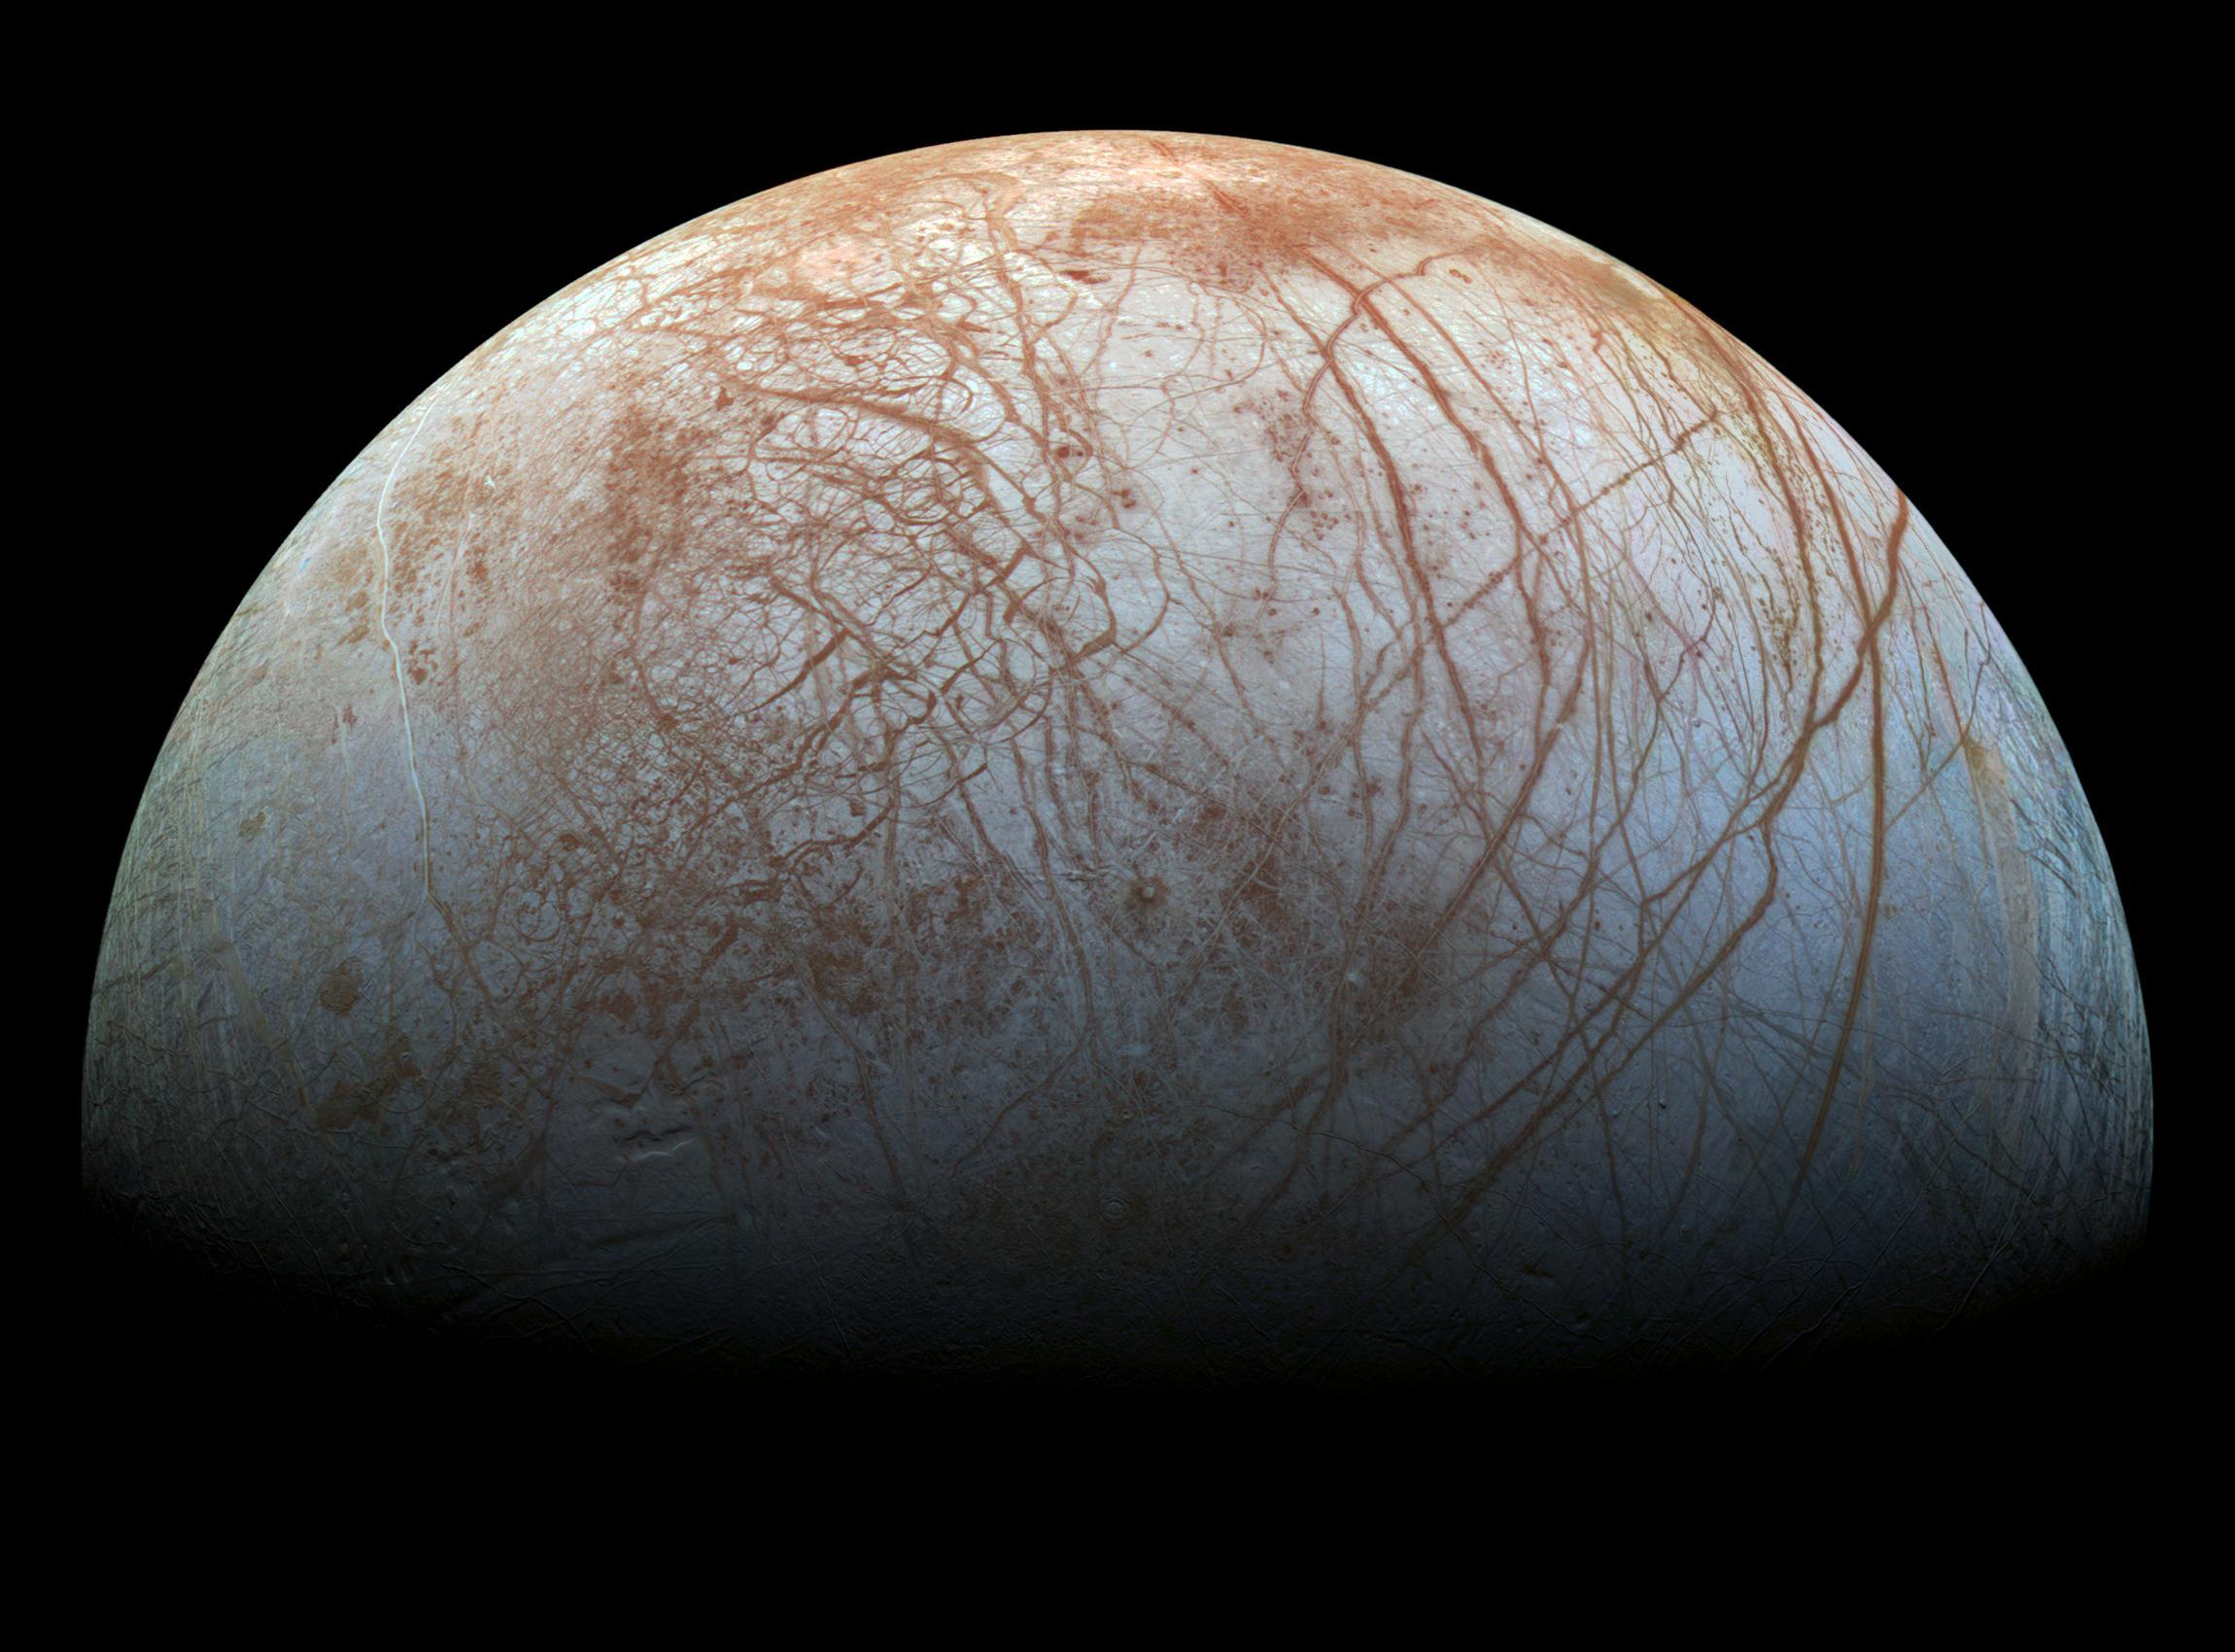 europa moon facts - HD2300×1700